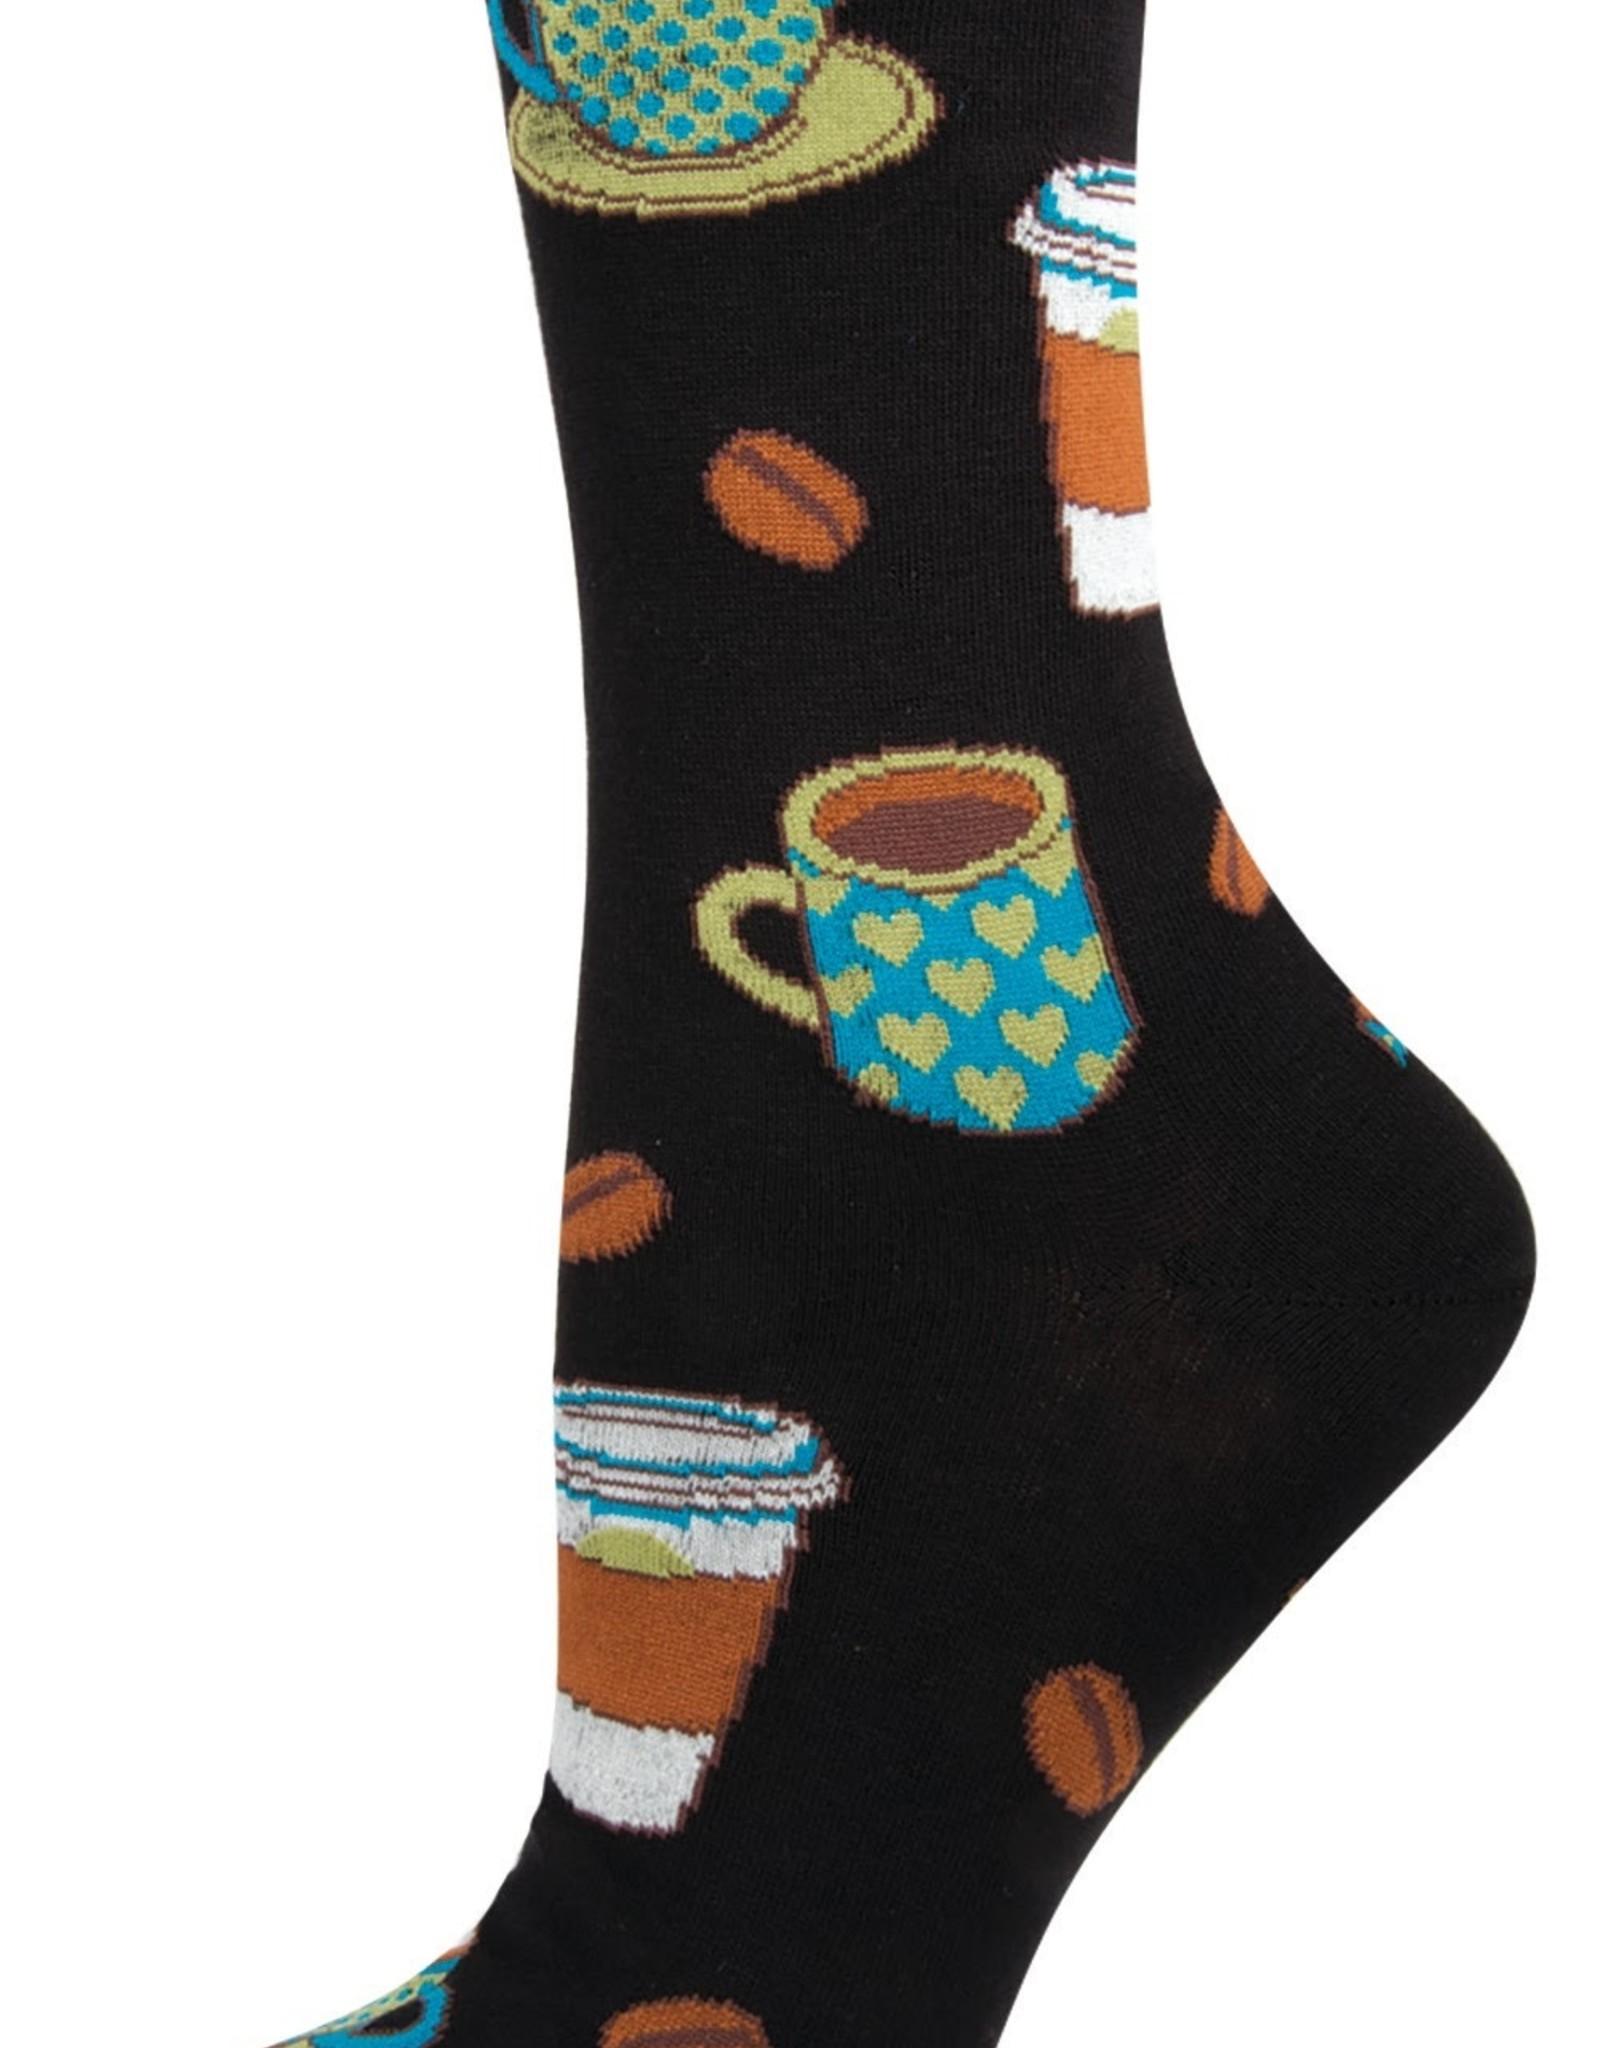 Love You a Latte socks